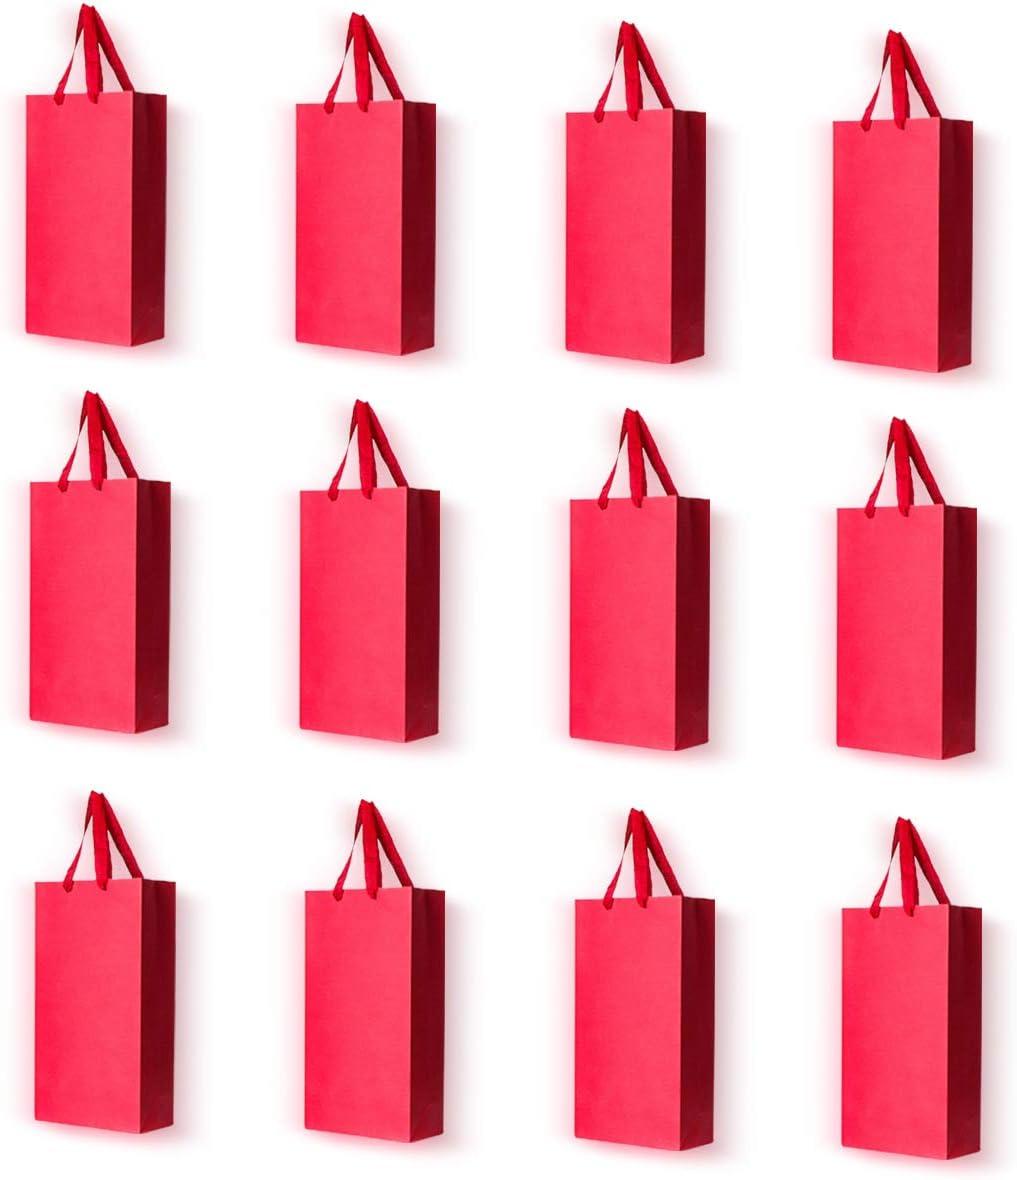 JUMINE Paquete de 12 bolsas de transporte para botellas de vino papel blanco y vino tinto bolsas de transporte con asas rojo 2 botellas